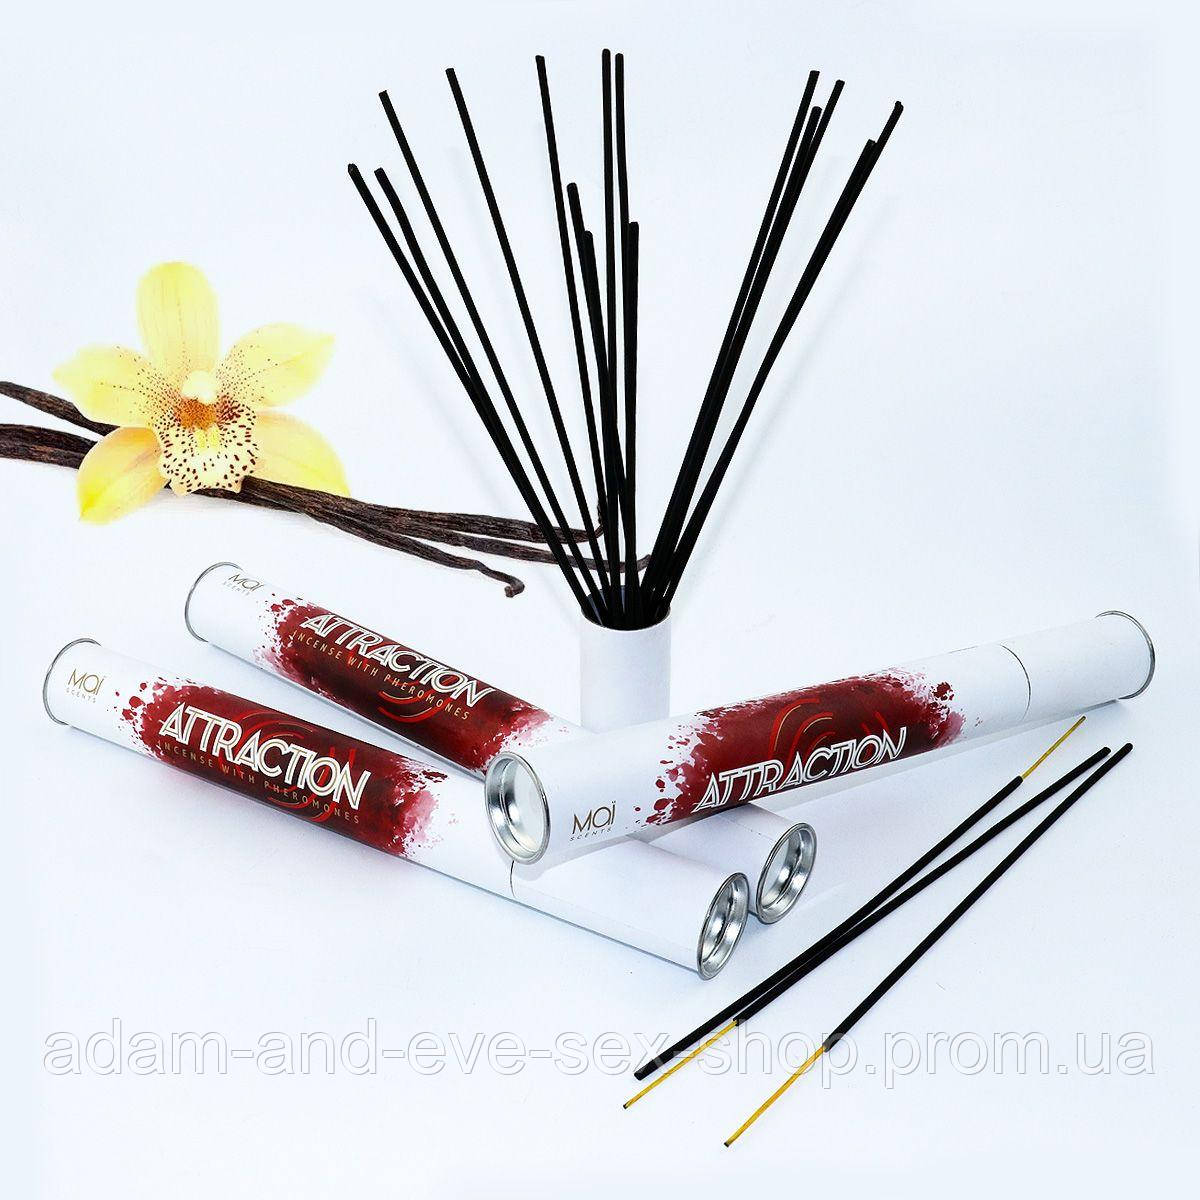 Ароматические палочки с феромонами MAI Vanilla (20 шт)